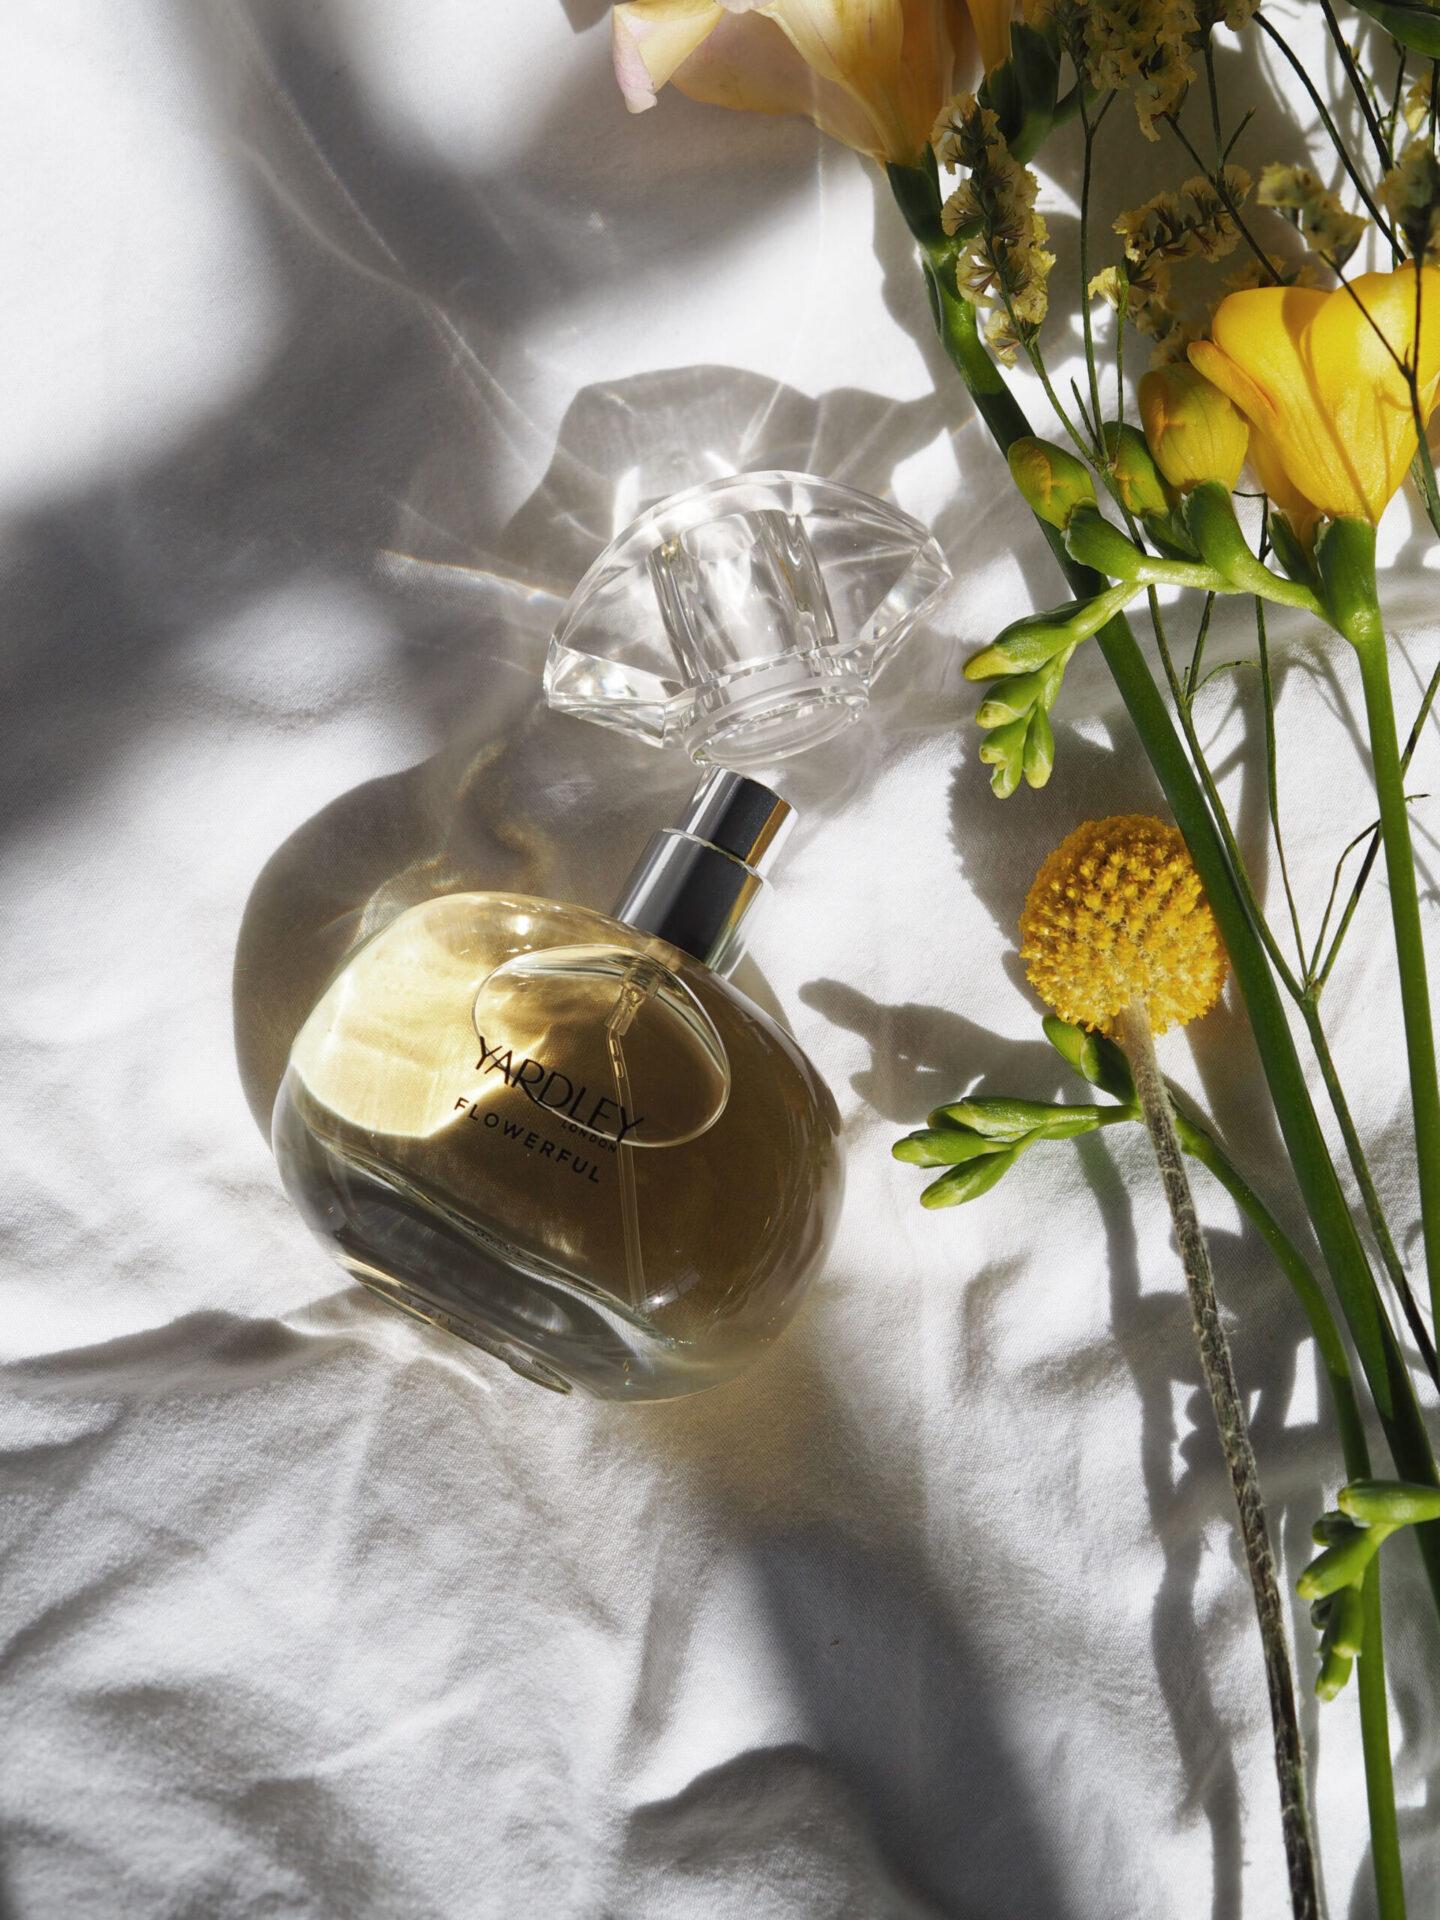 yardley english daisy review